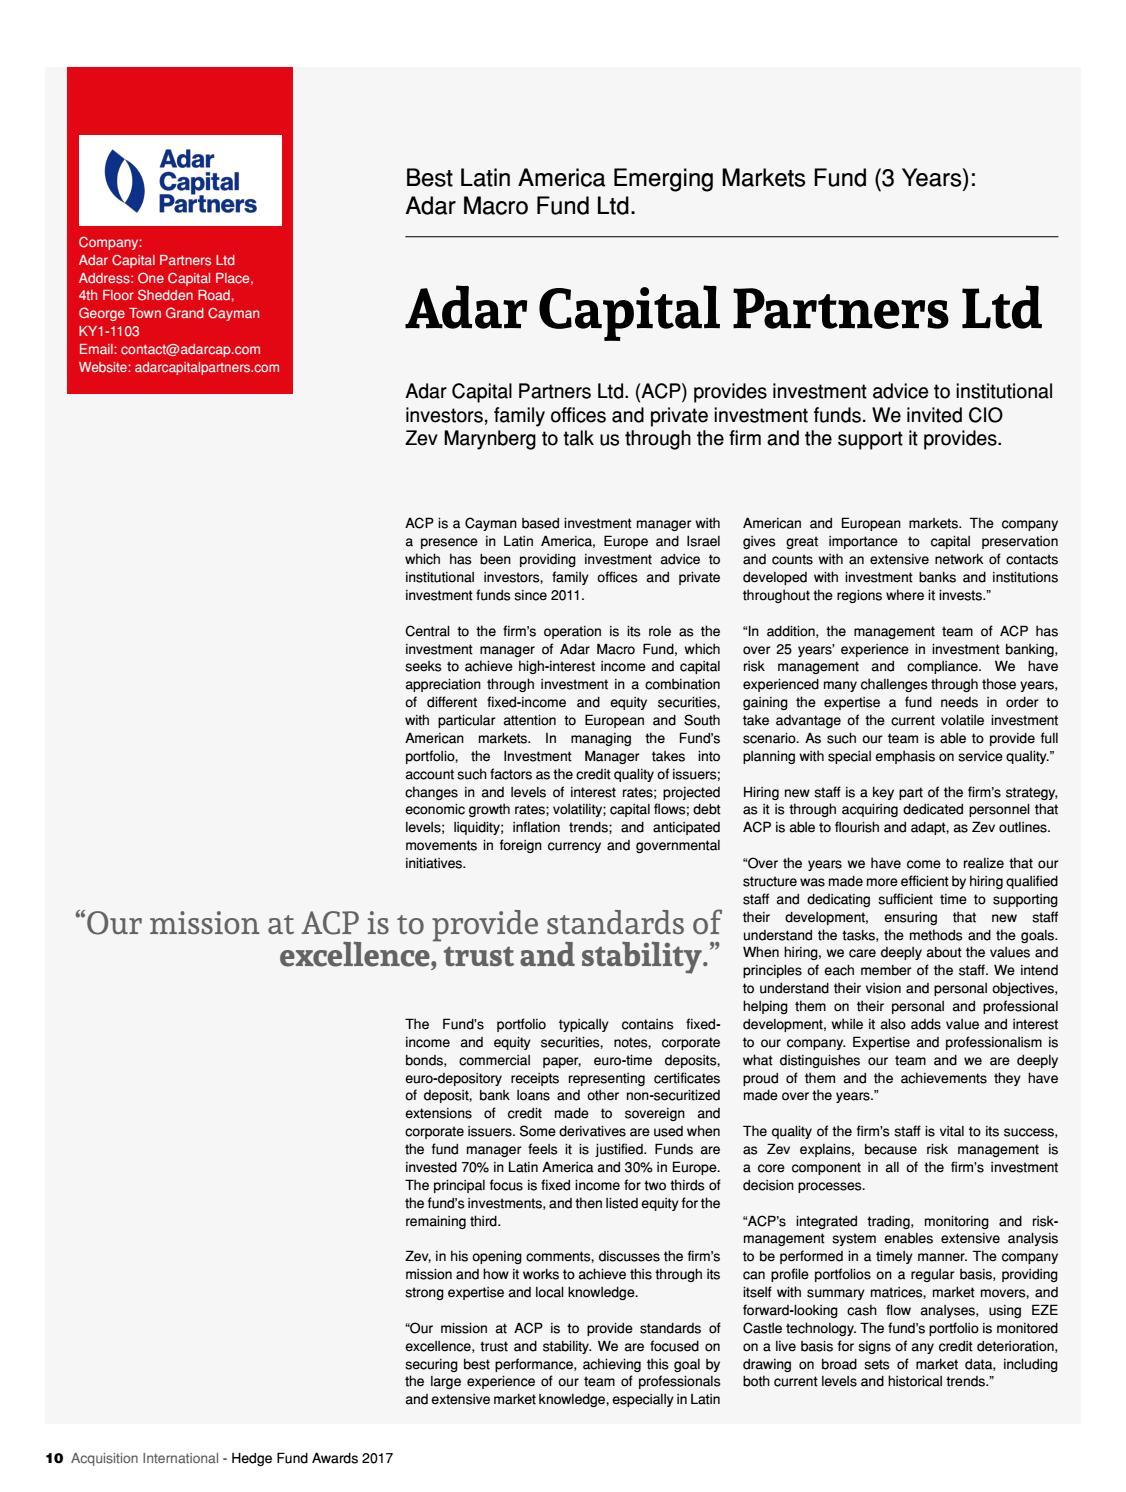 Adar Investment Management